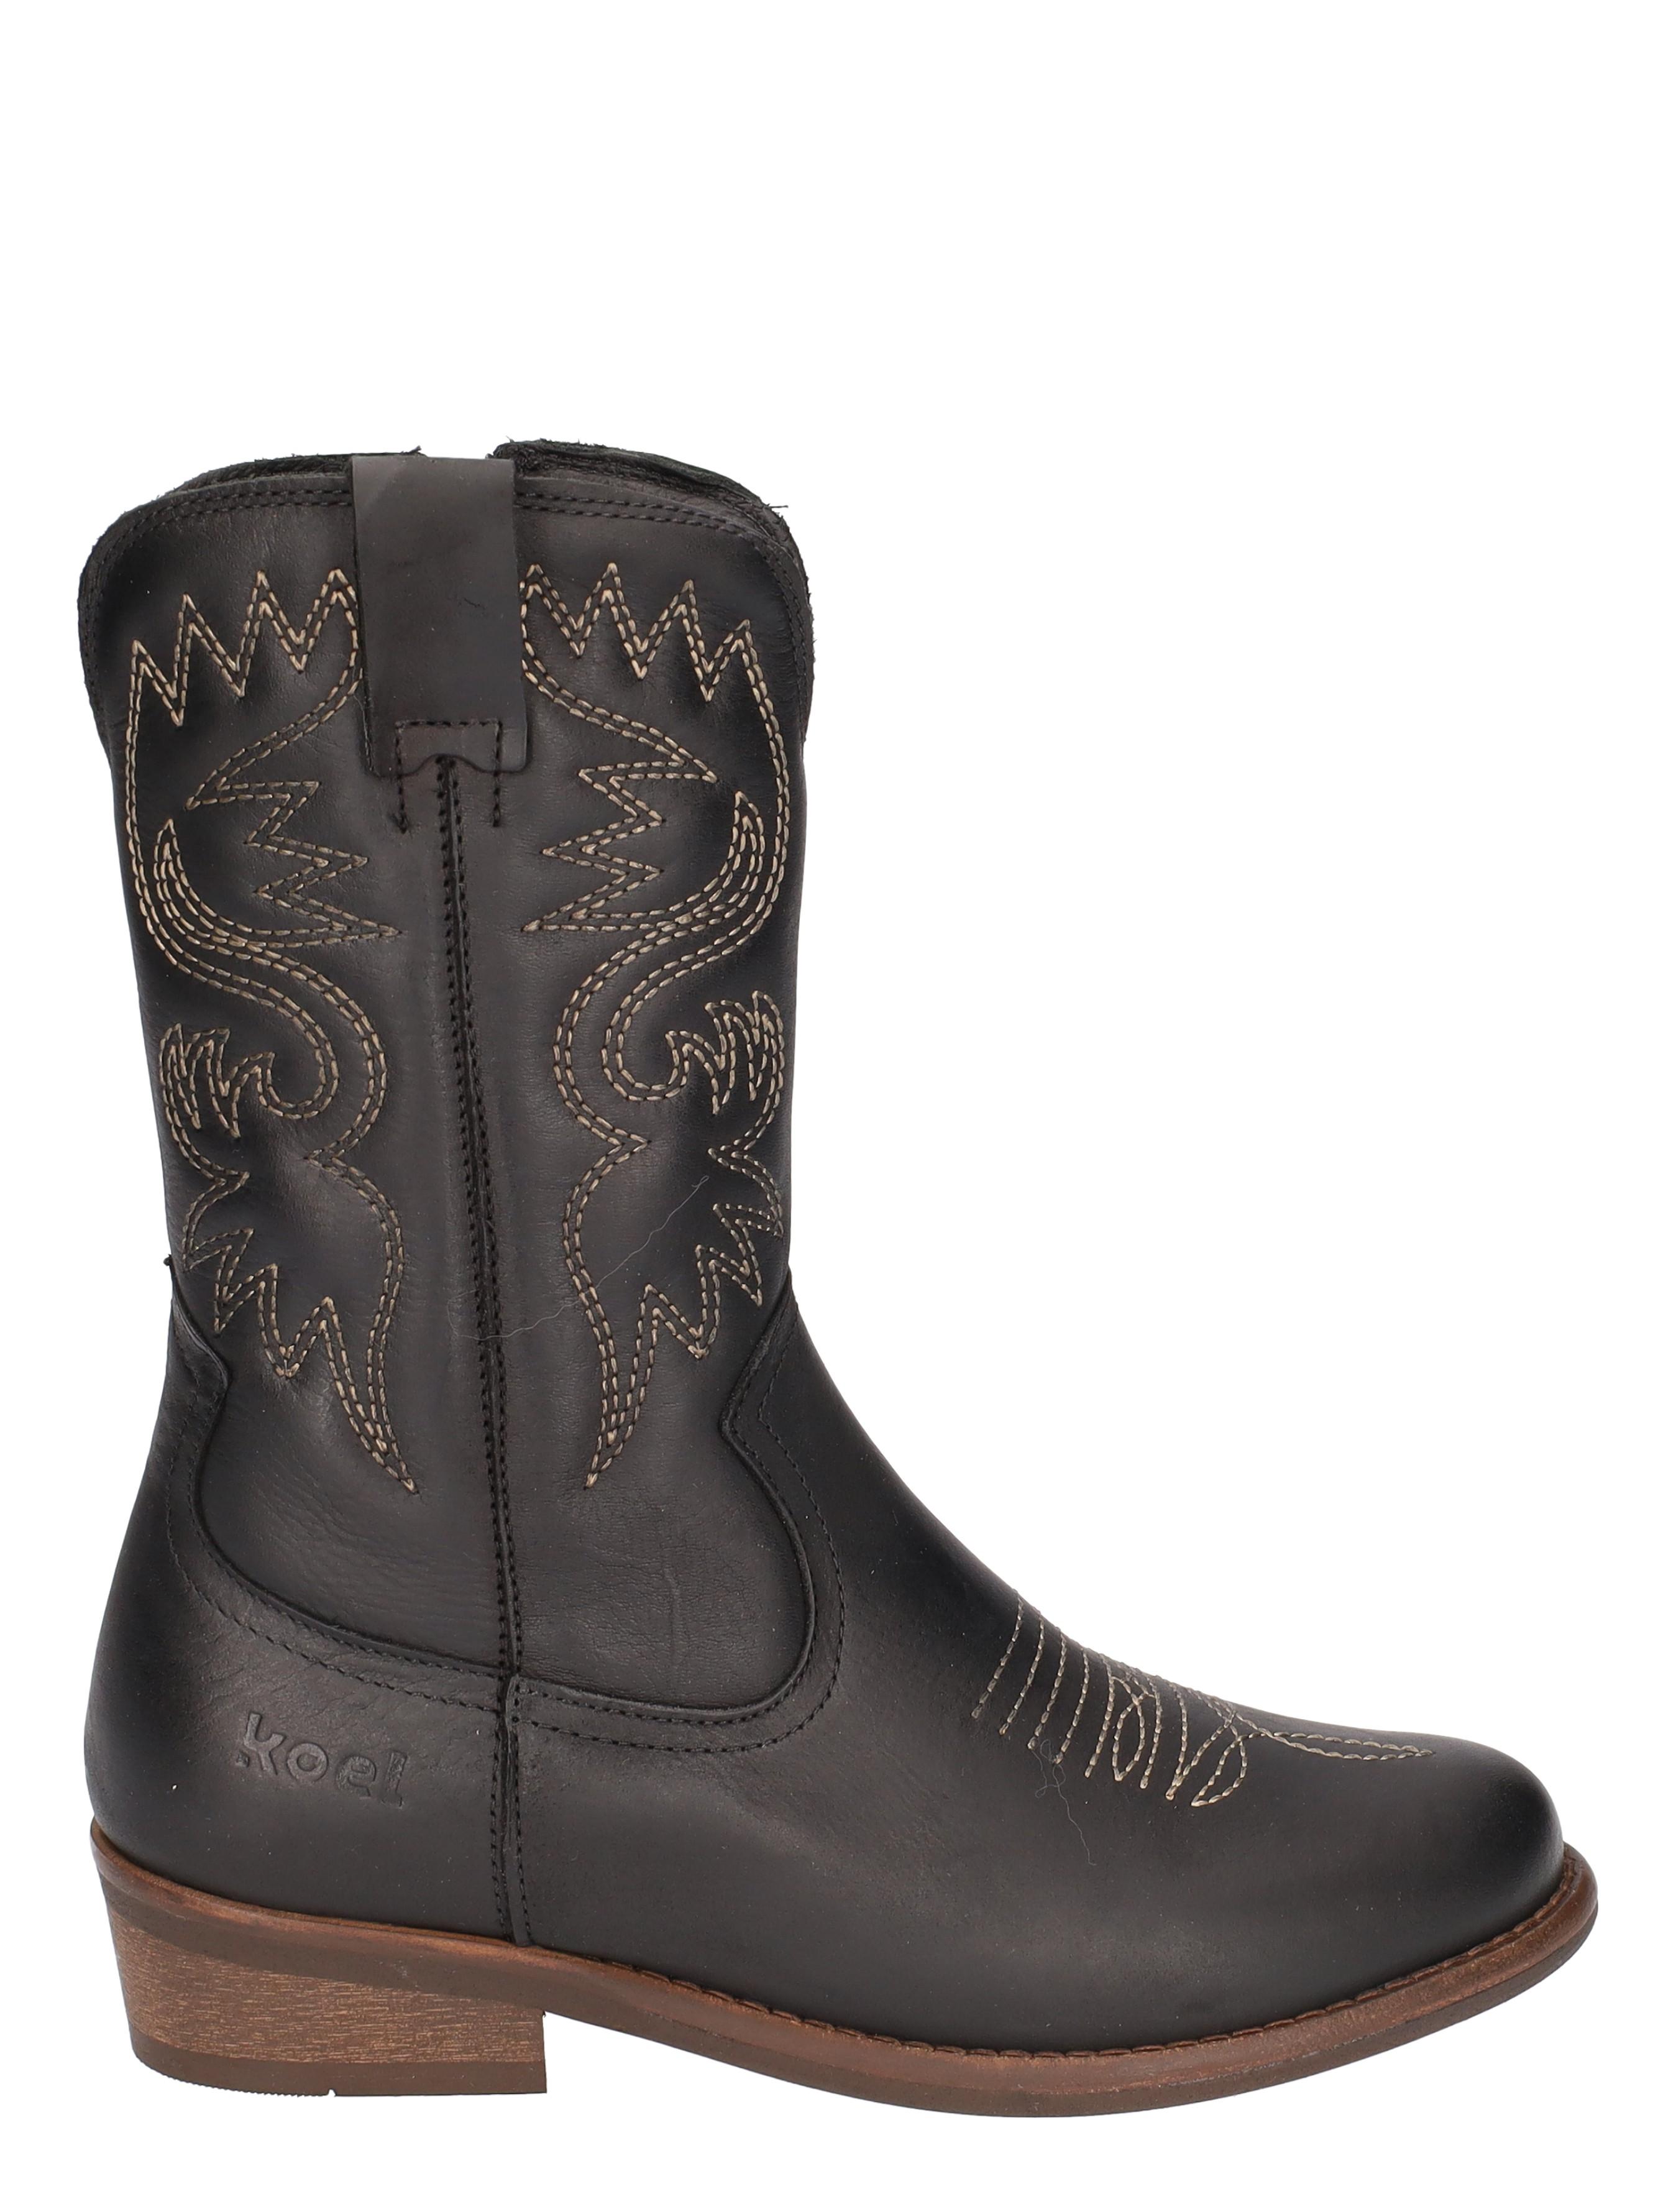 Koel4Kids 10M006.231 Black Western boots